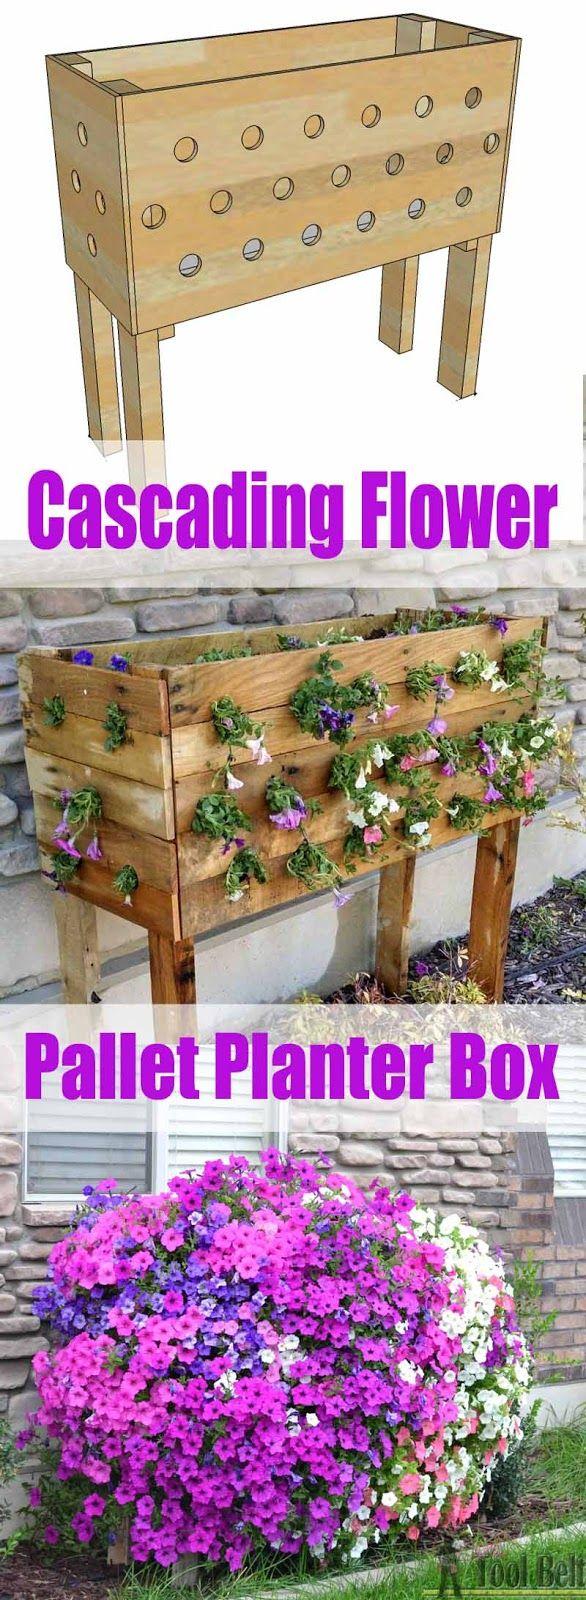 Pallet Box Planter for Cascading Flowers